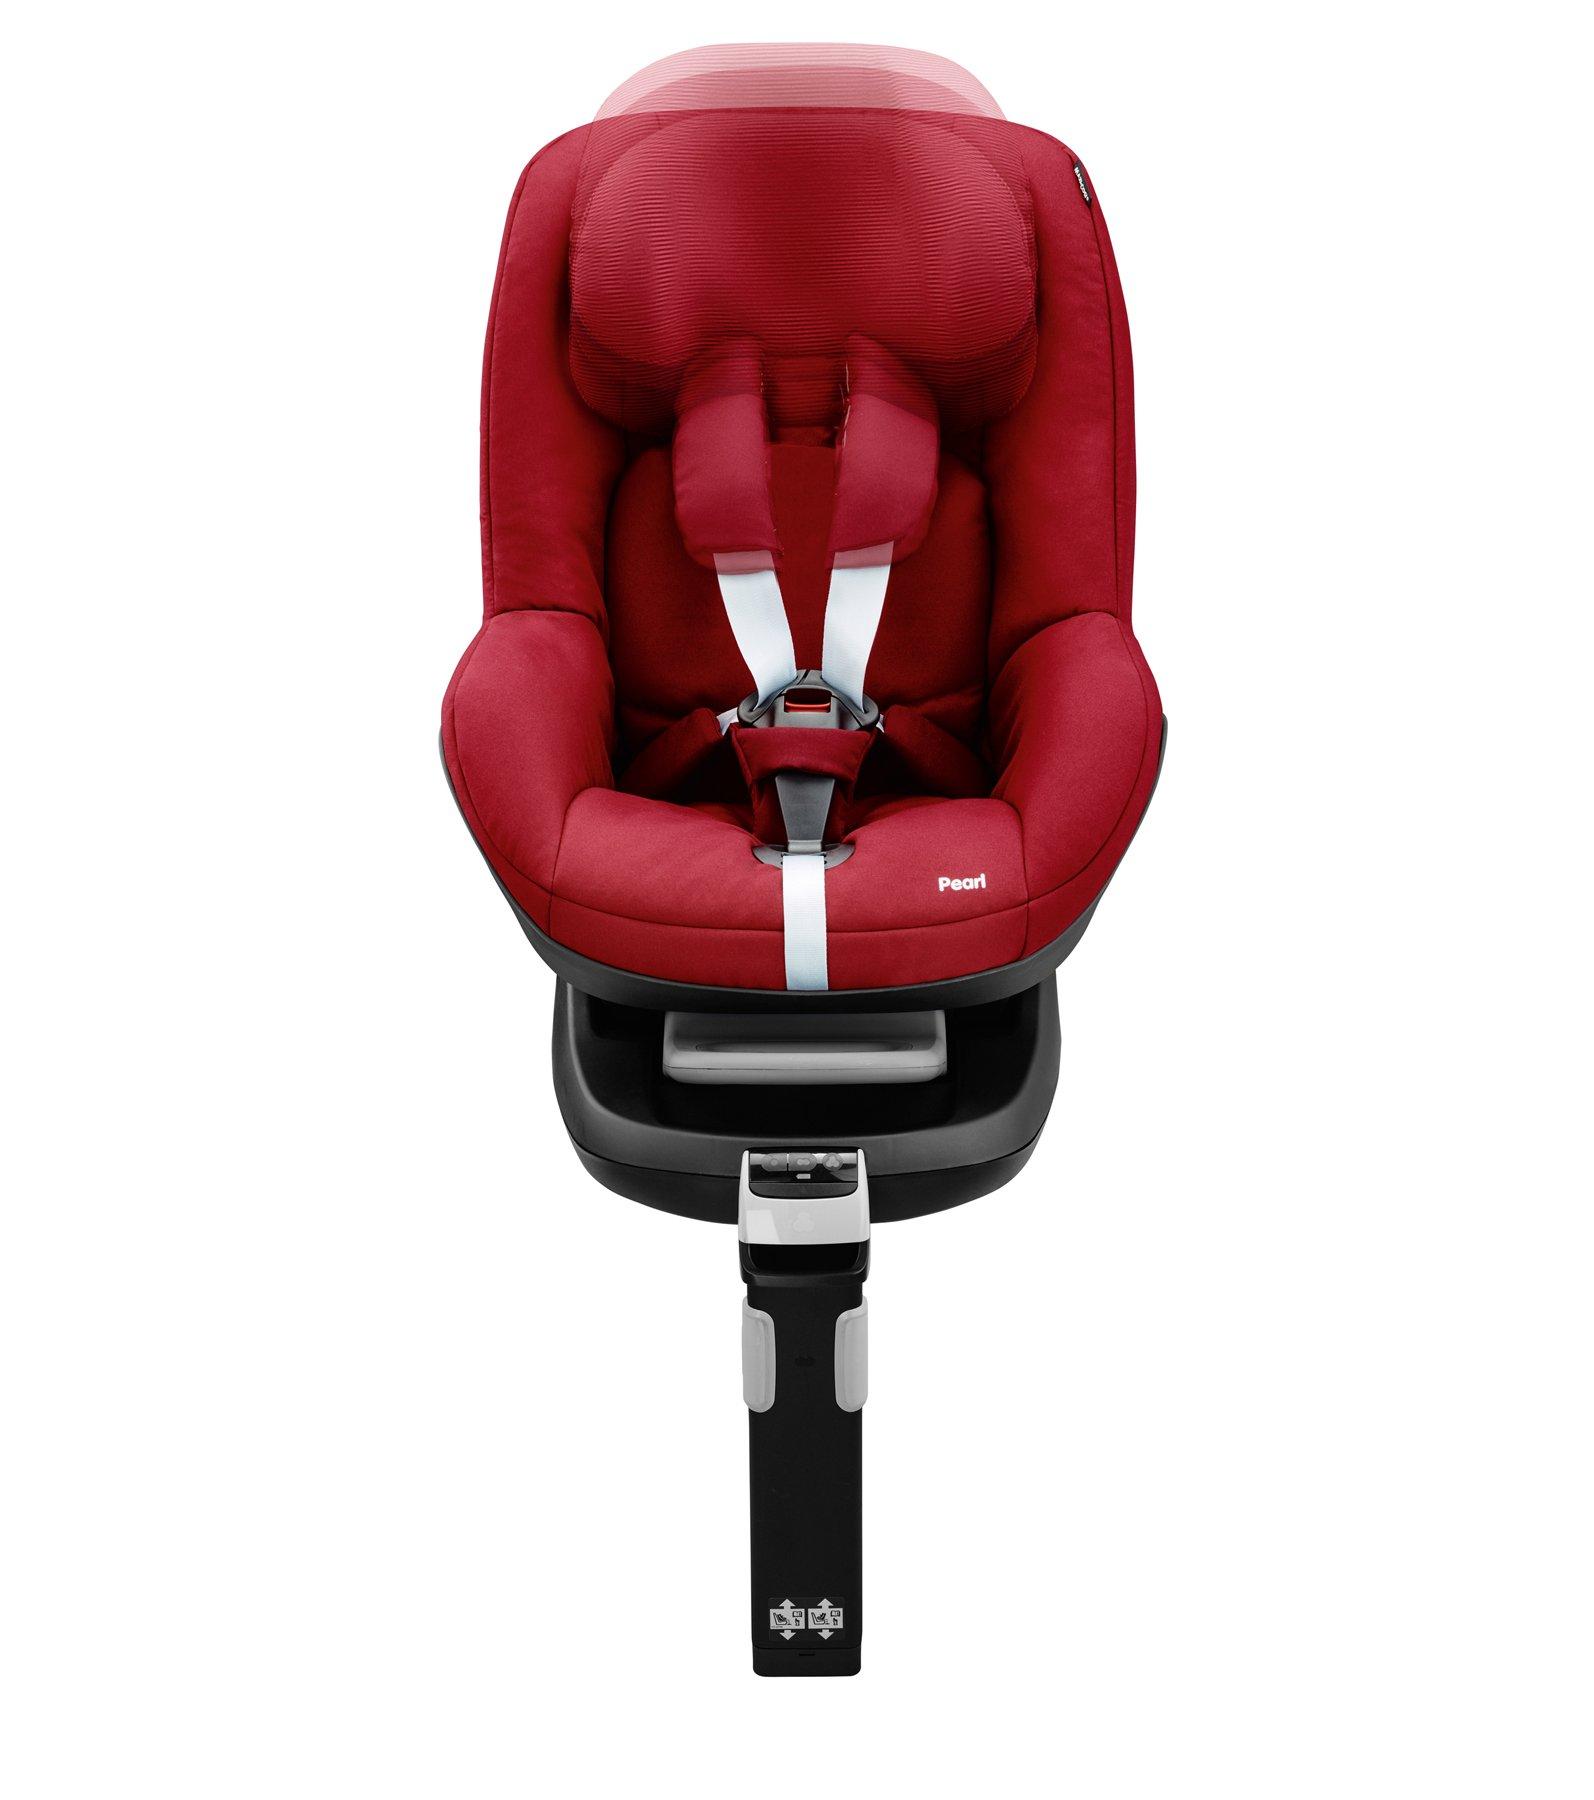 Maxi-Cosi 63409641Pearl Children's Seat, Group 1, 9-18kg Maxi-Cosi  69